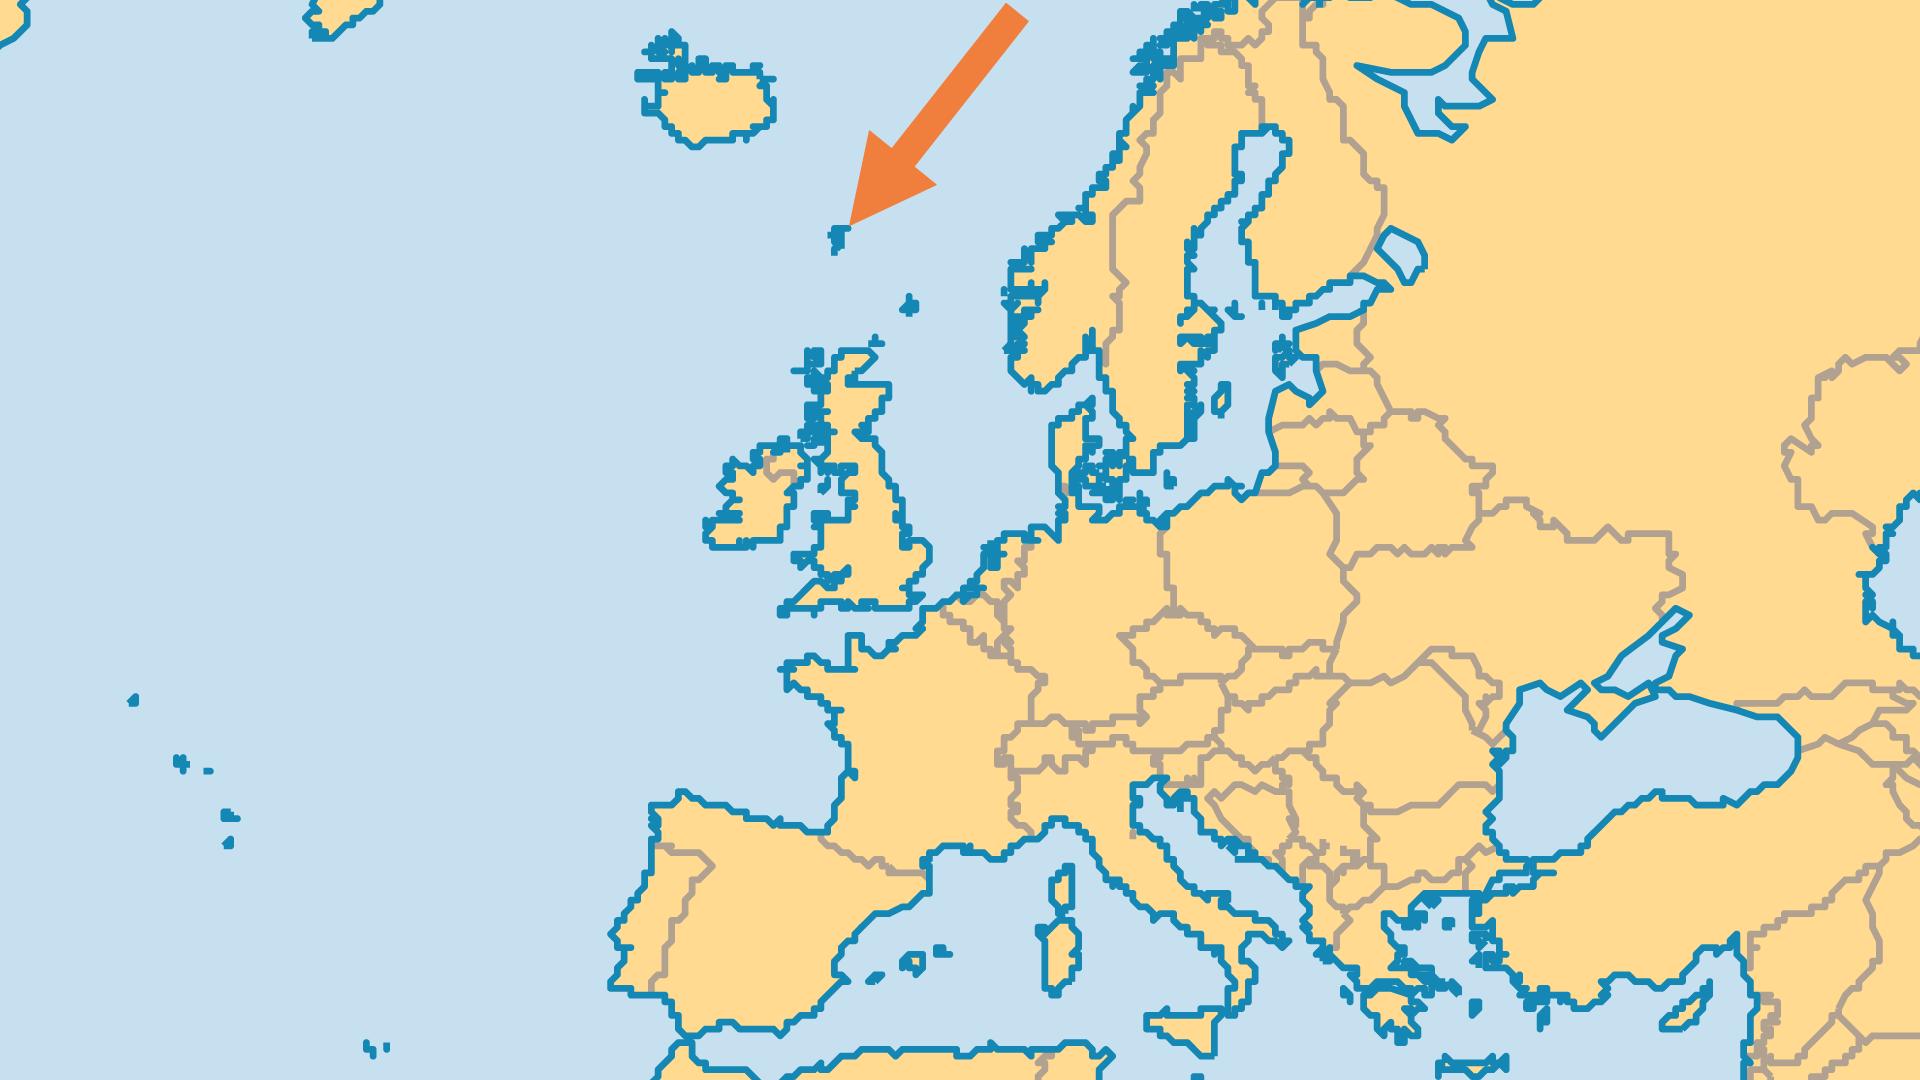 Locator Map for Faroe Islands